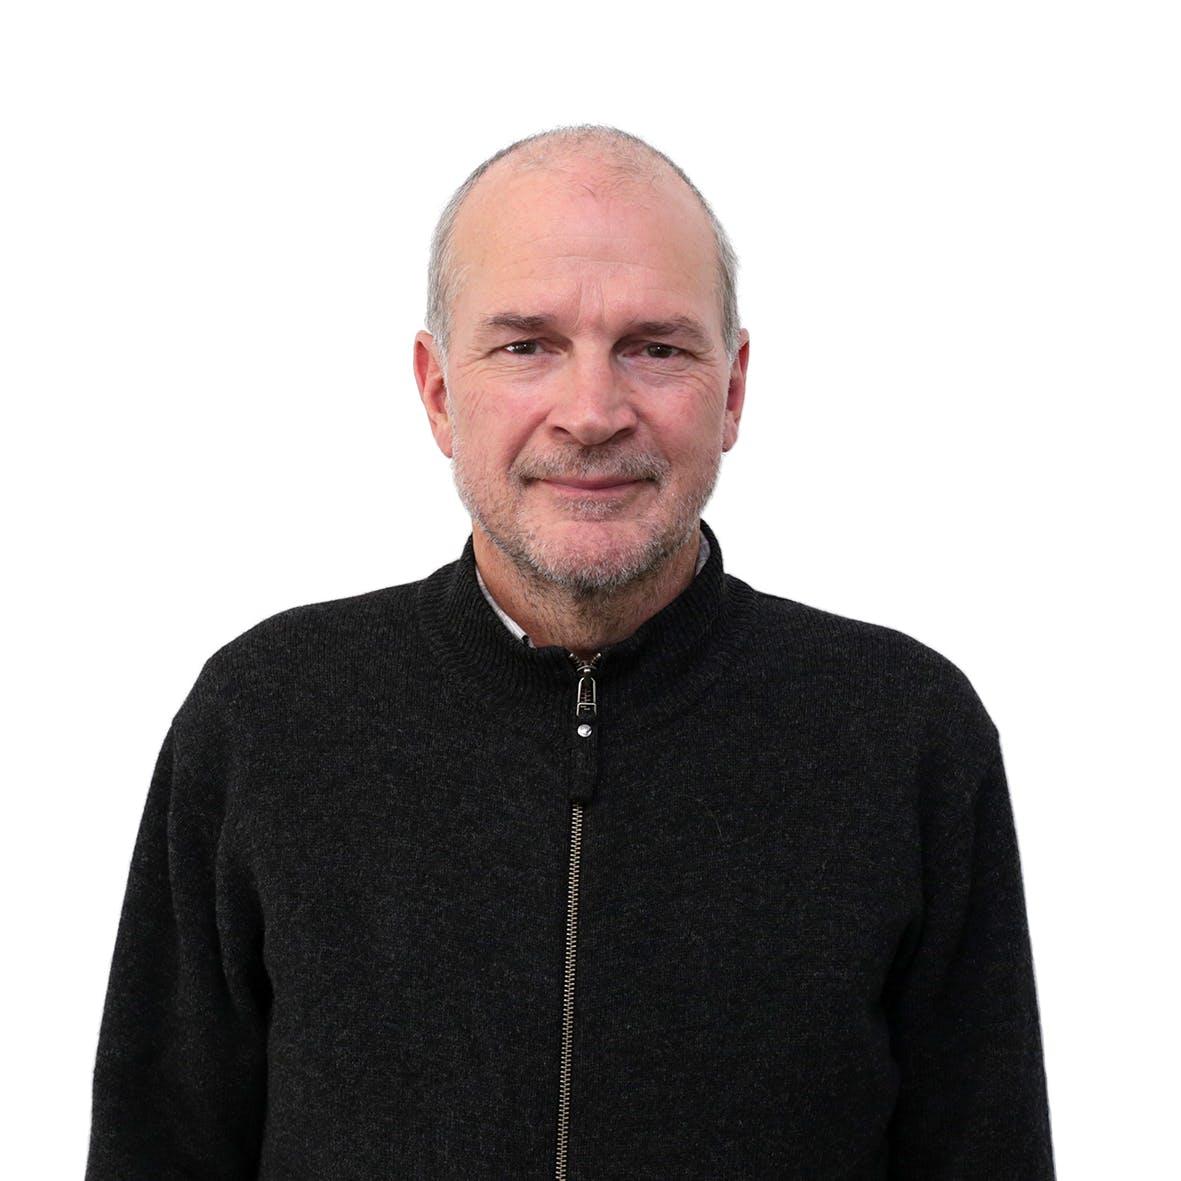 Pete Doig